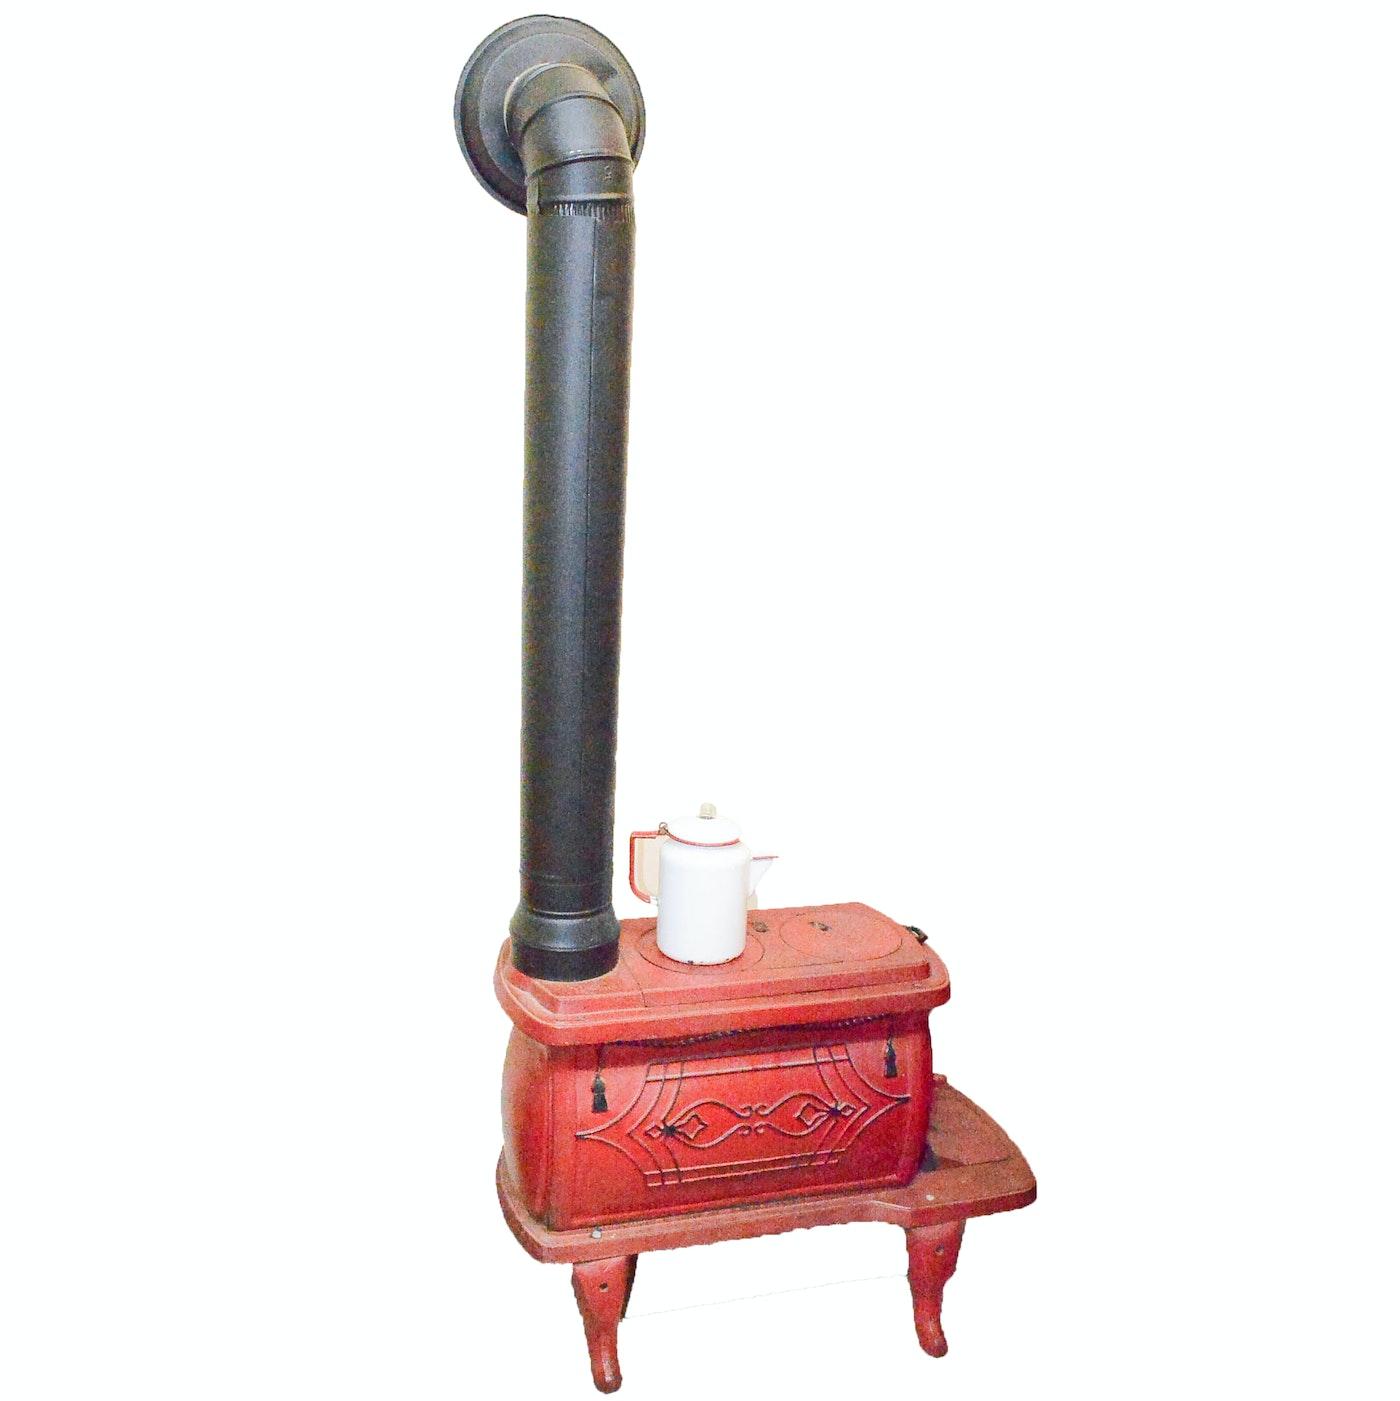 Antique Dixie Foundry Co Cast Iron Wood Burning Stove Ebth